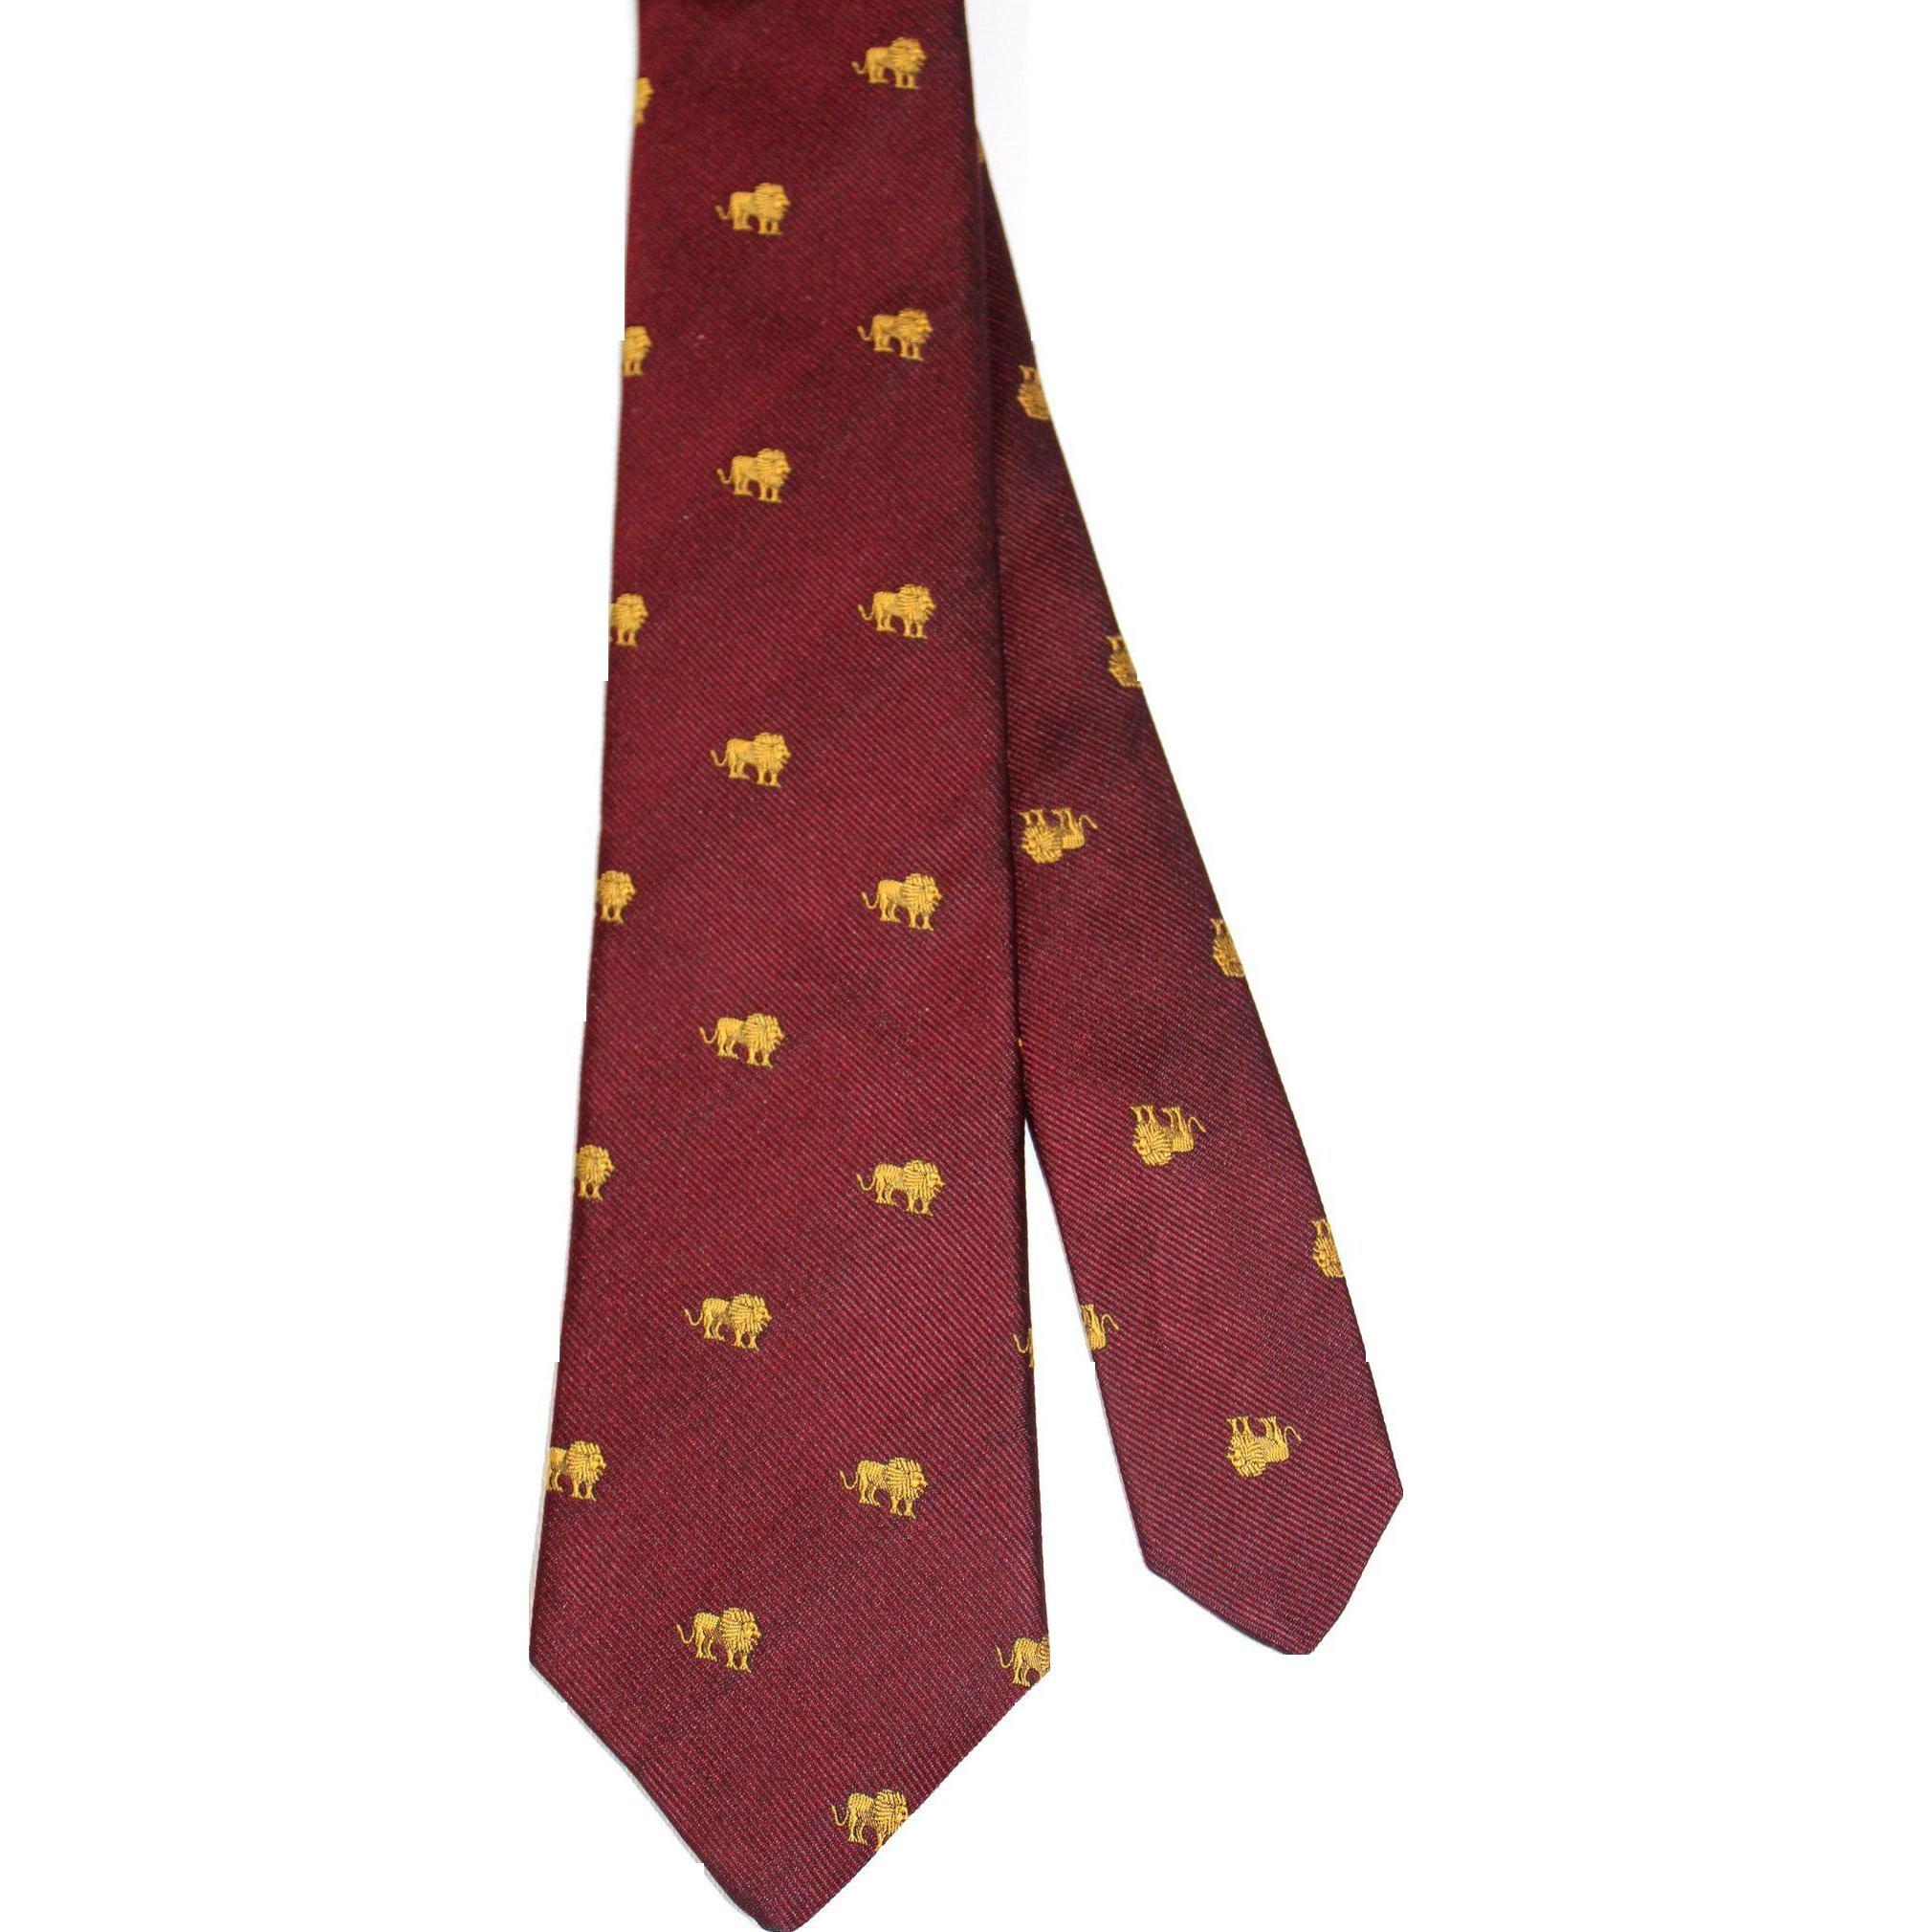 Vintage c.1980 Horchow Wine Silk Novelty Club Tie w/Gold Lions